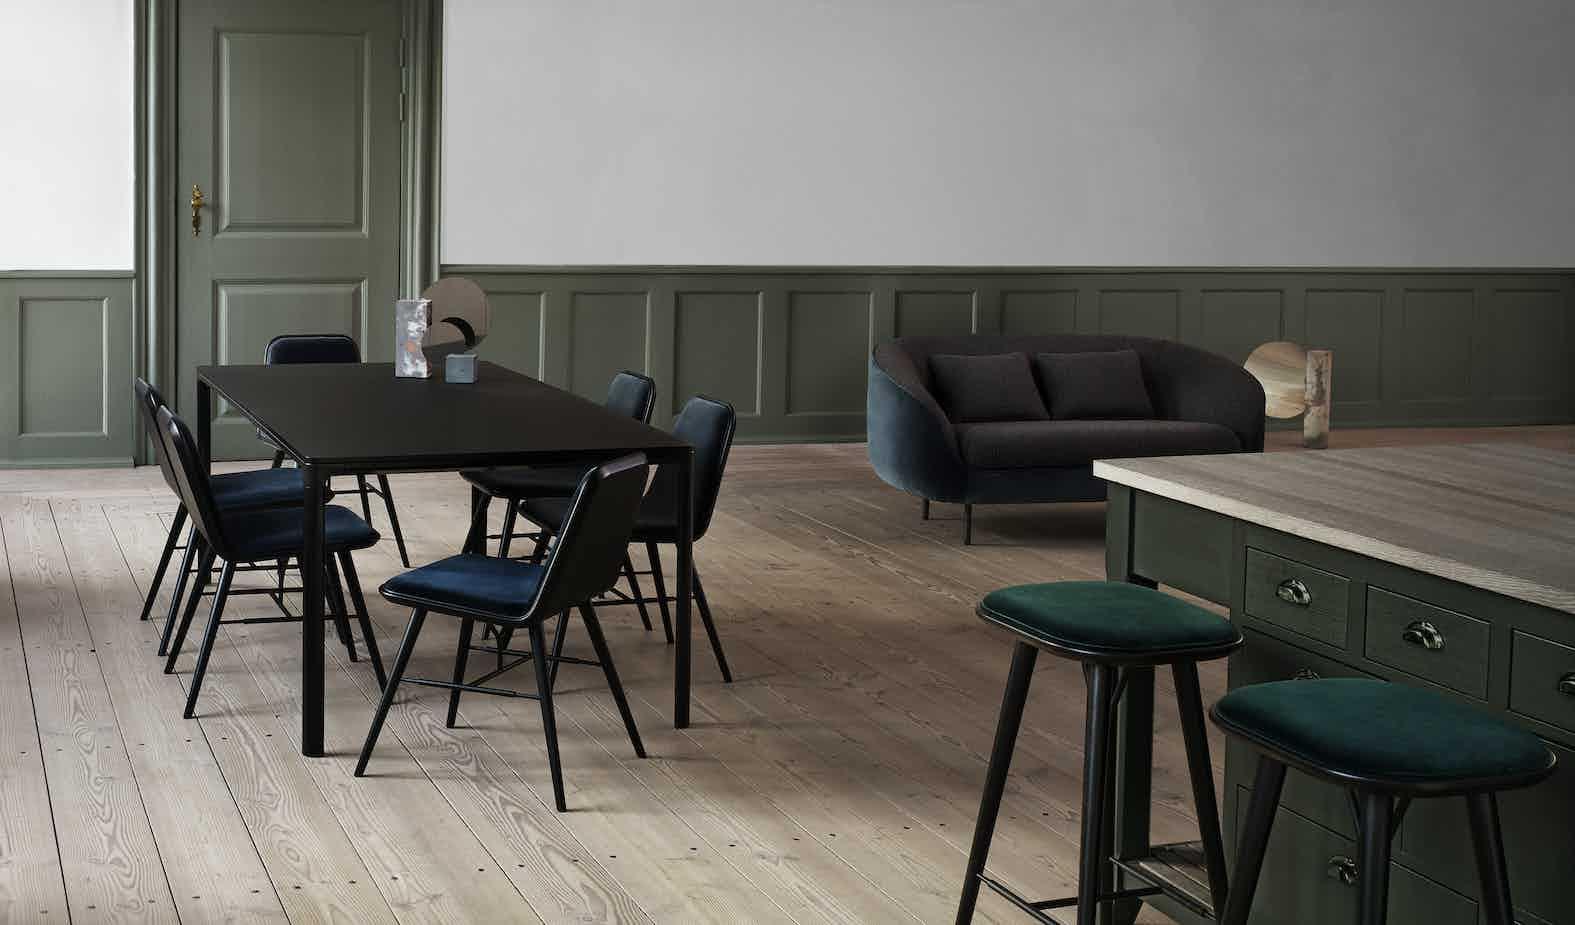 Fredericia Furniture Haiku 2 Seat Insitu Angle Haute Living